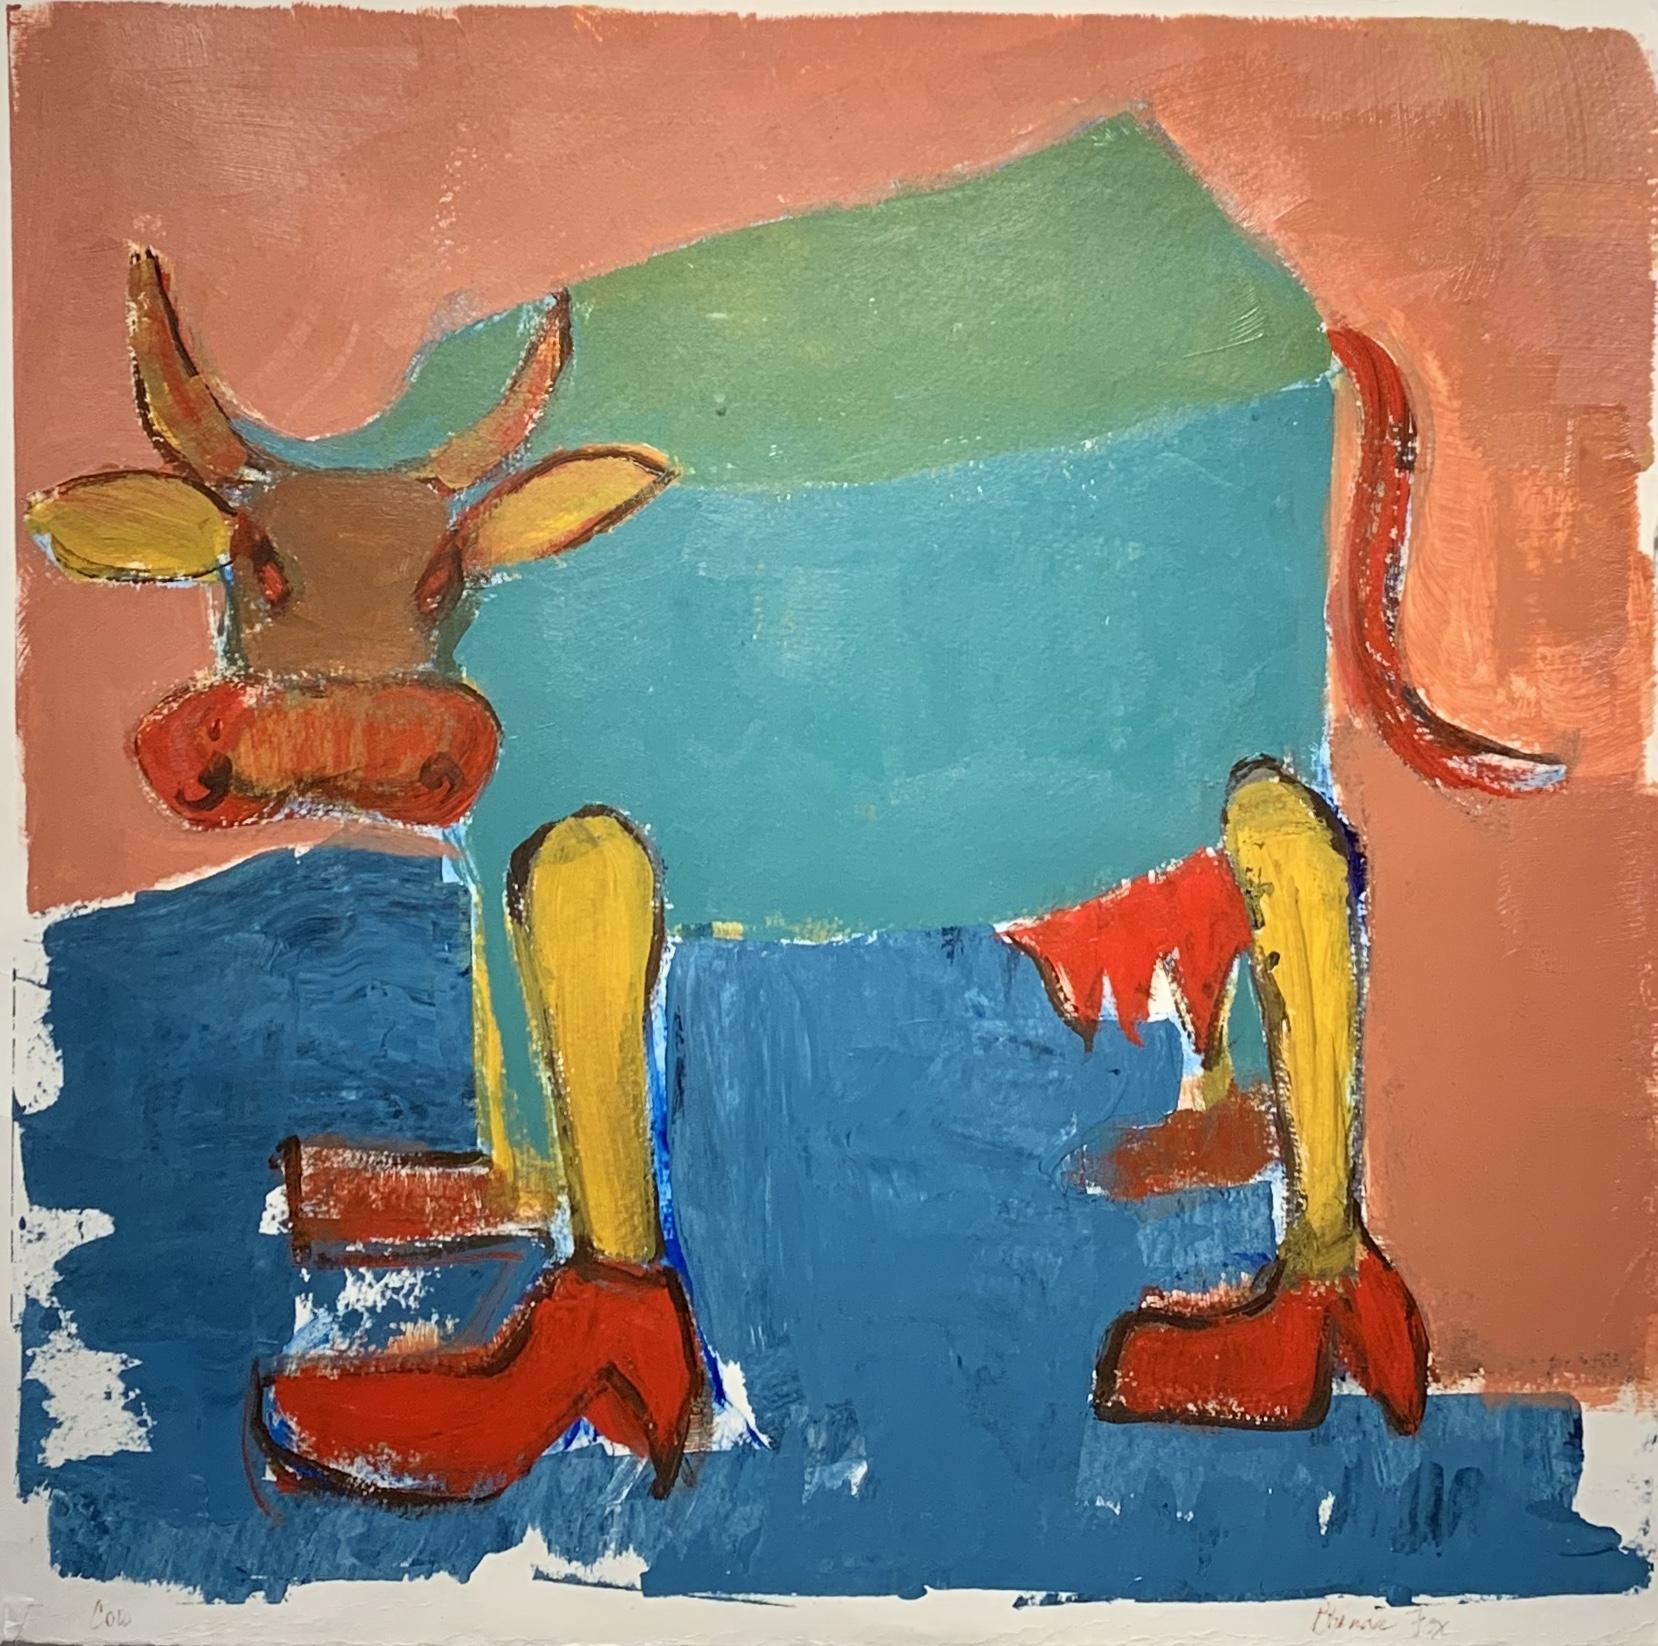 Cow by  Brenda Fox - Masterpiece Online